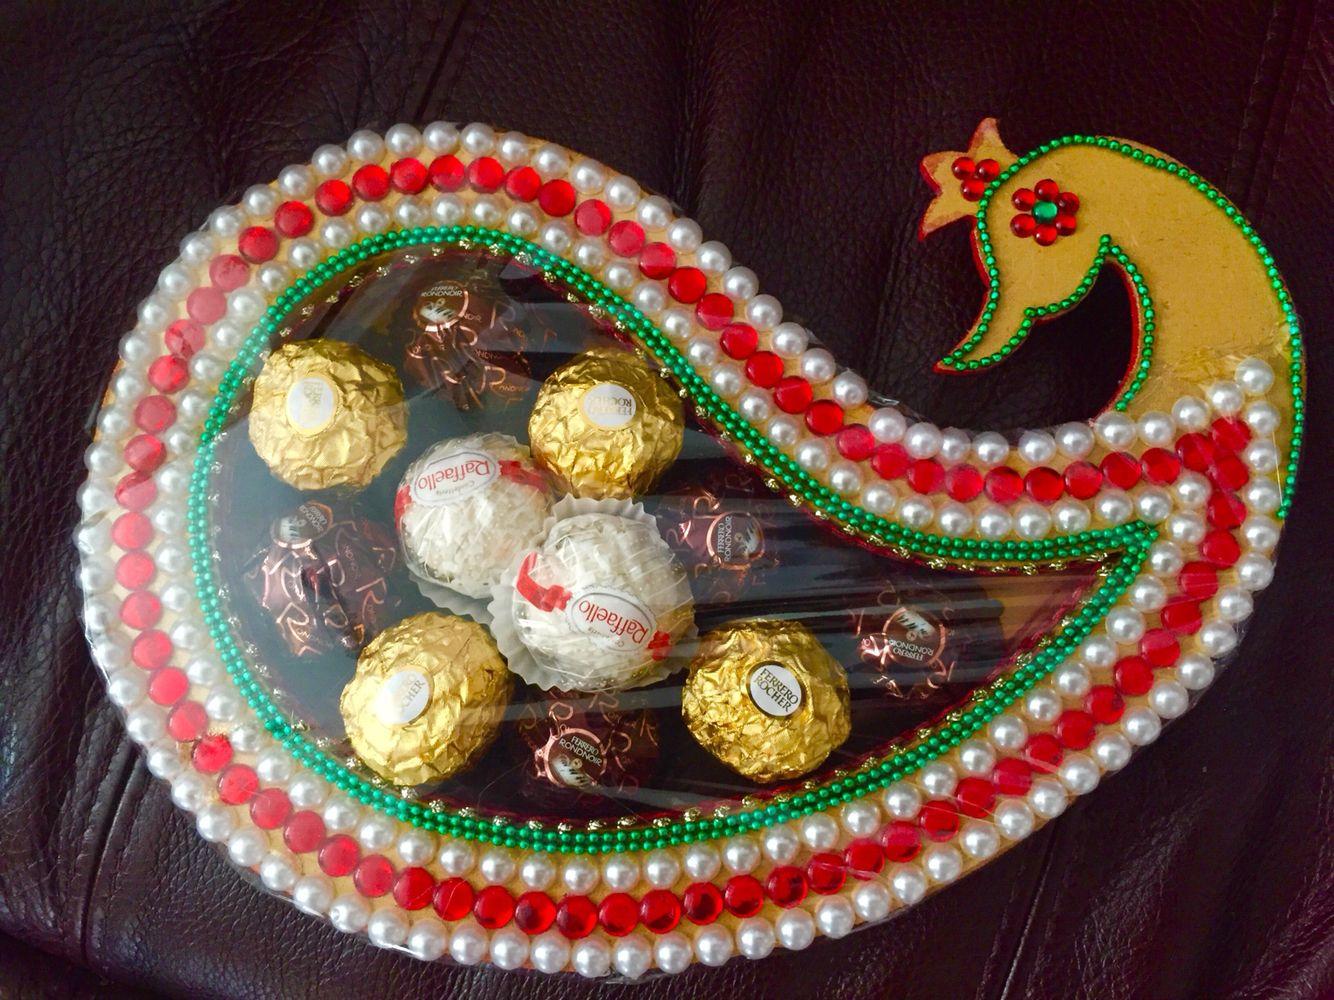 Indian Wedding Decor Chocolate Tray